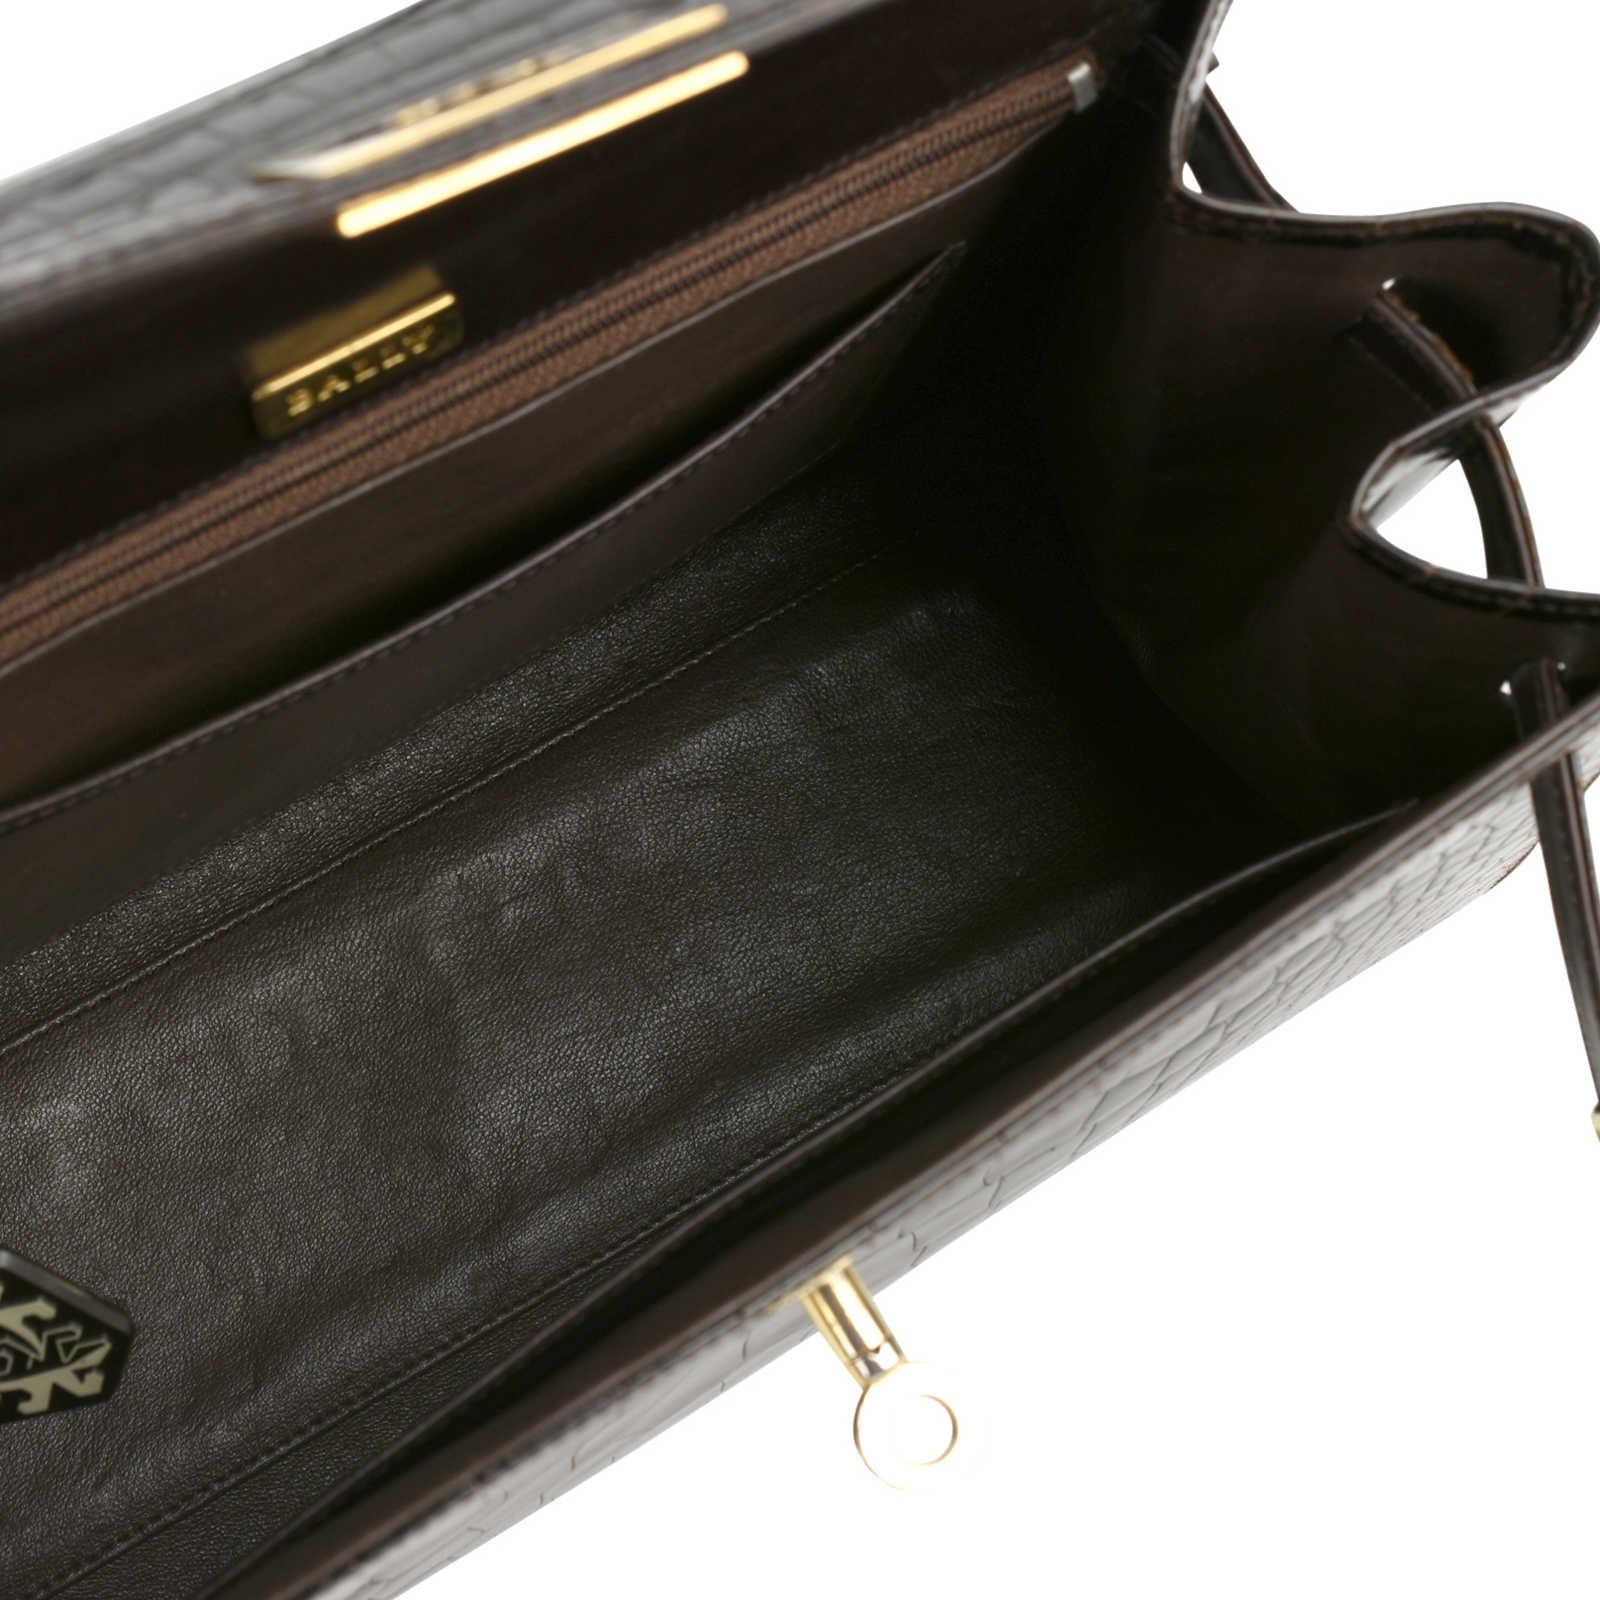 955a79b83ea3 ... Authentic Vintage Bally Kelly Style Bag (PSS-355-00023) - Thumbnail 8  ...